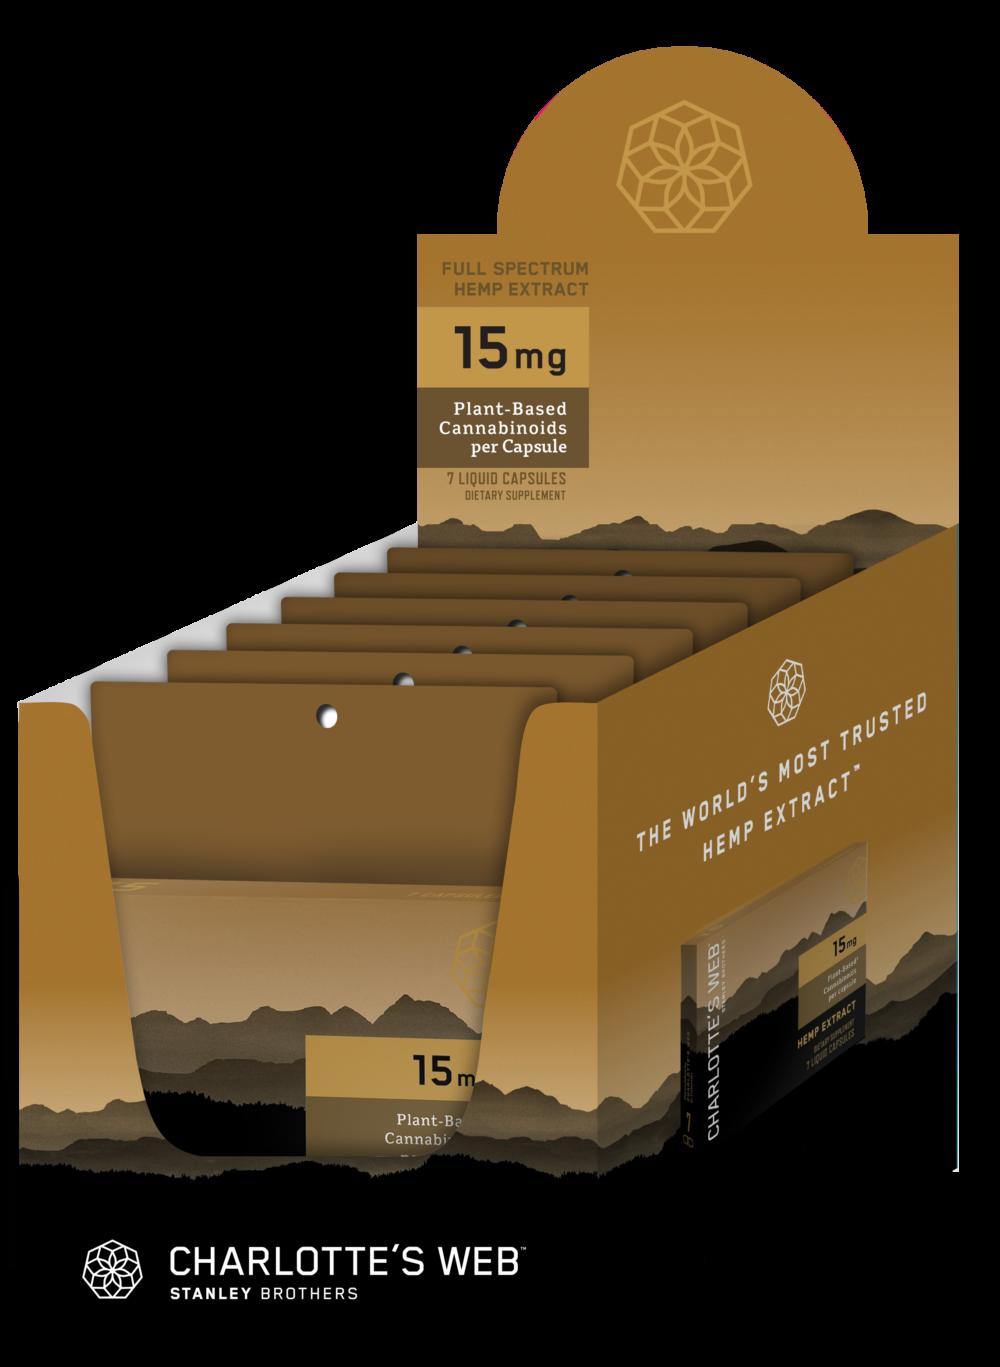 Charlotte's Web - CBD Capsules: 15mg - 7  Liquid Capsules per bag